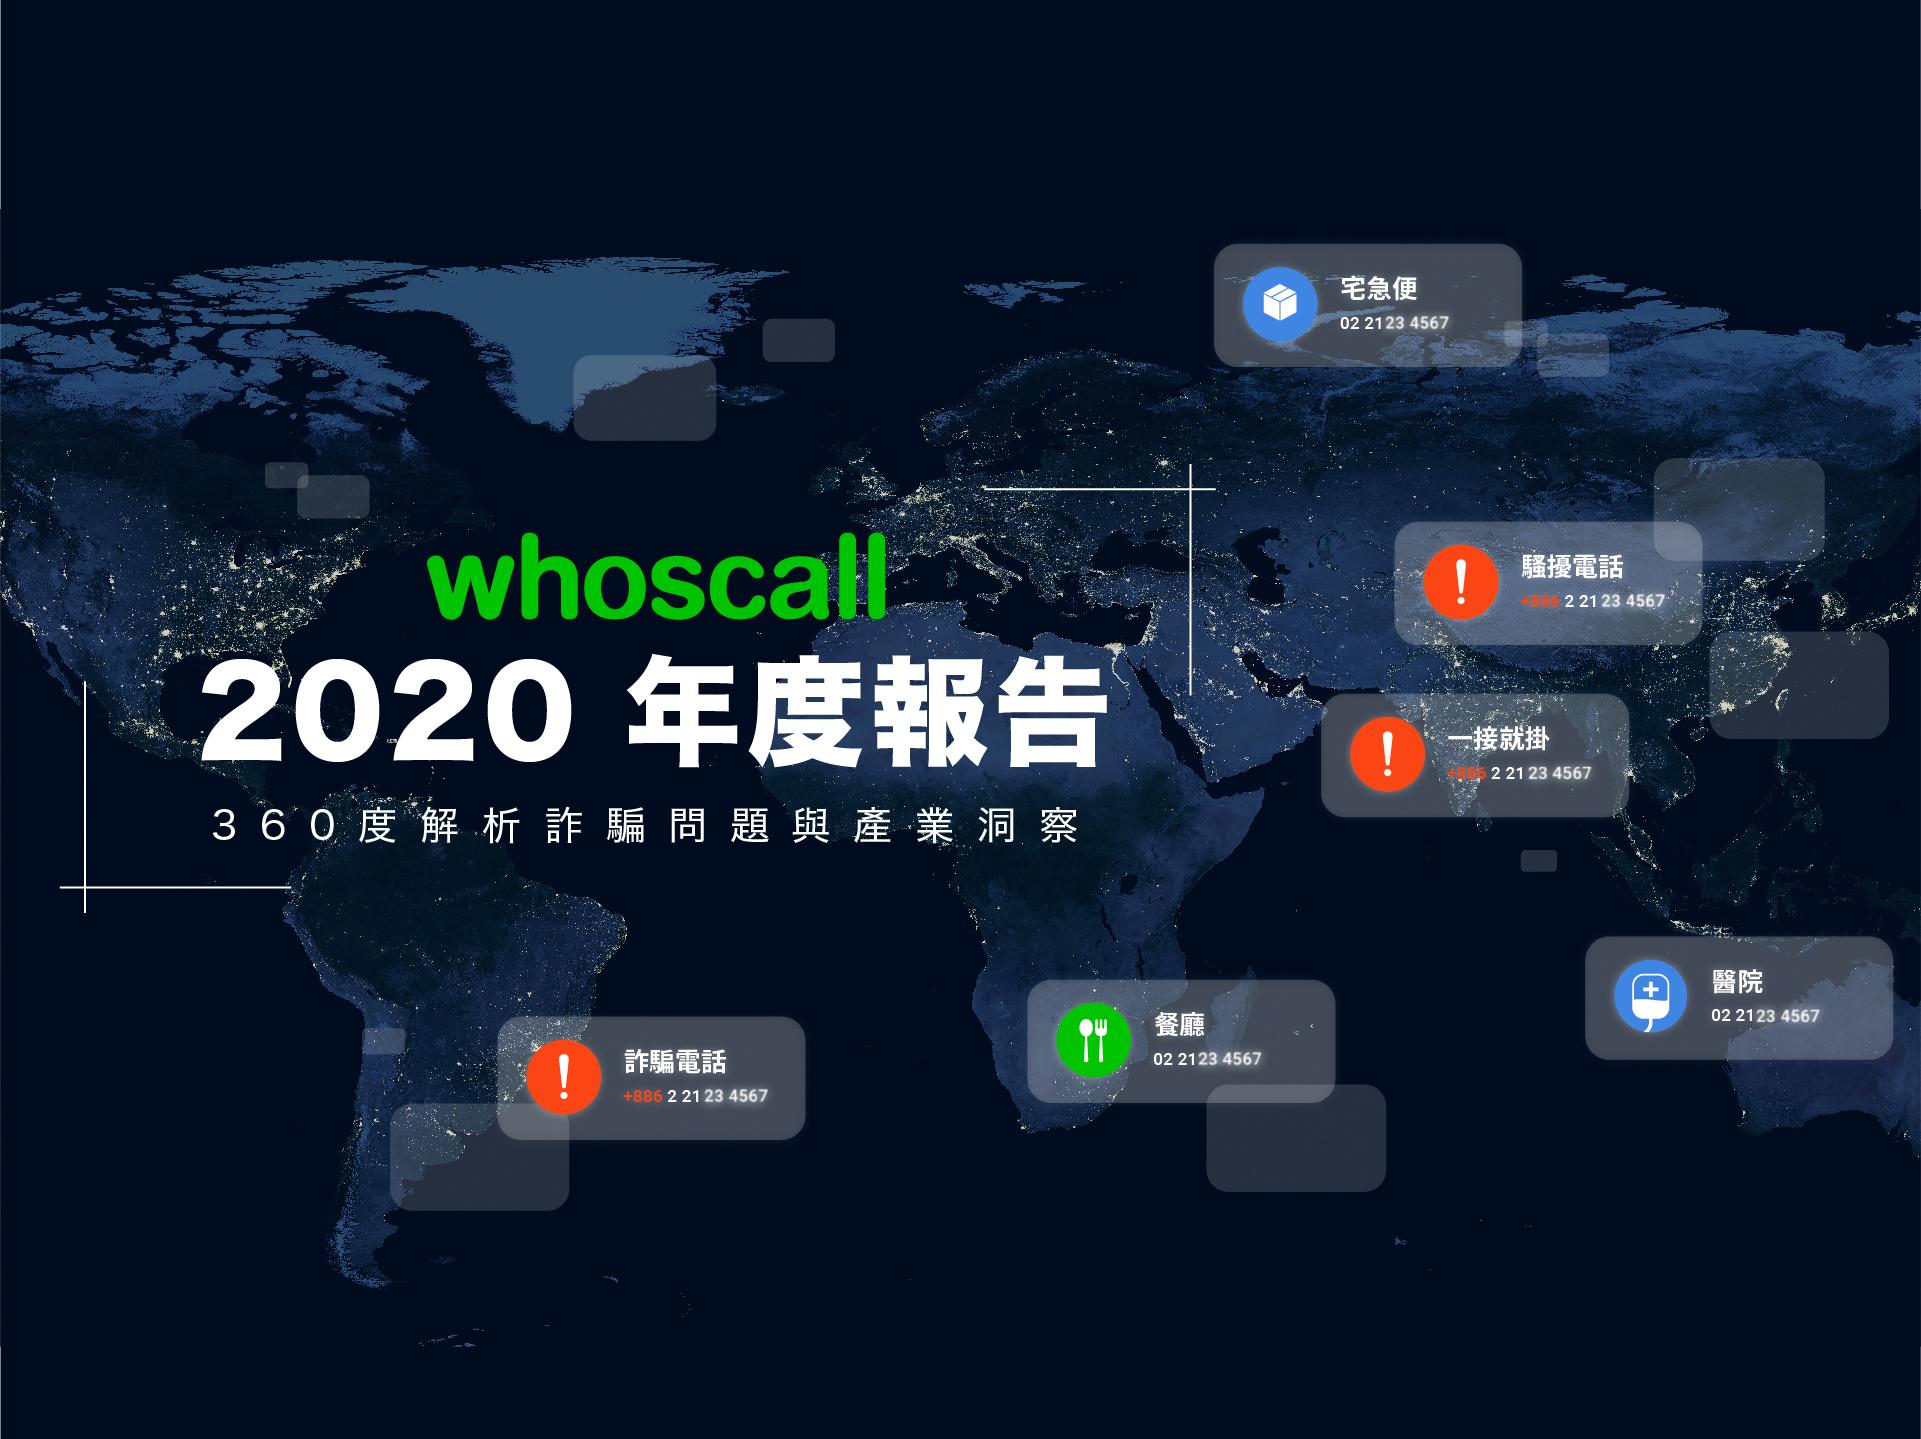 Whoscall 首發陌生電話查詢辨識排行榜!年度關鍵指標一次掌握